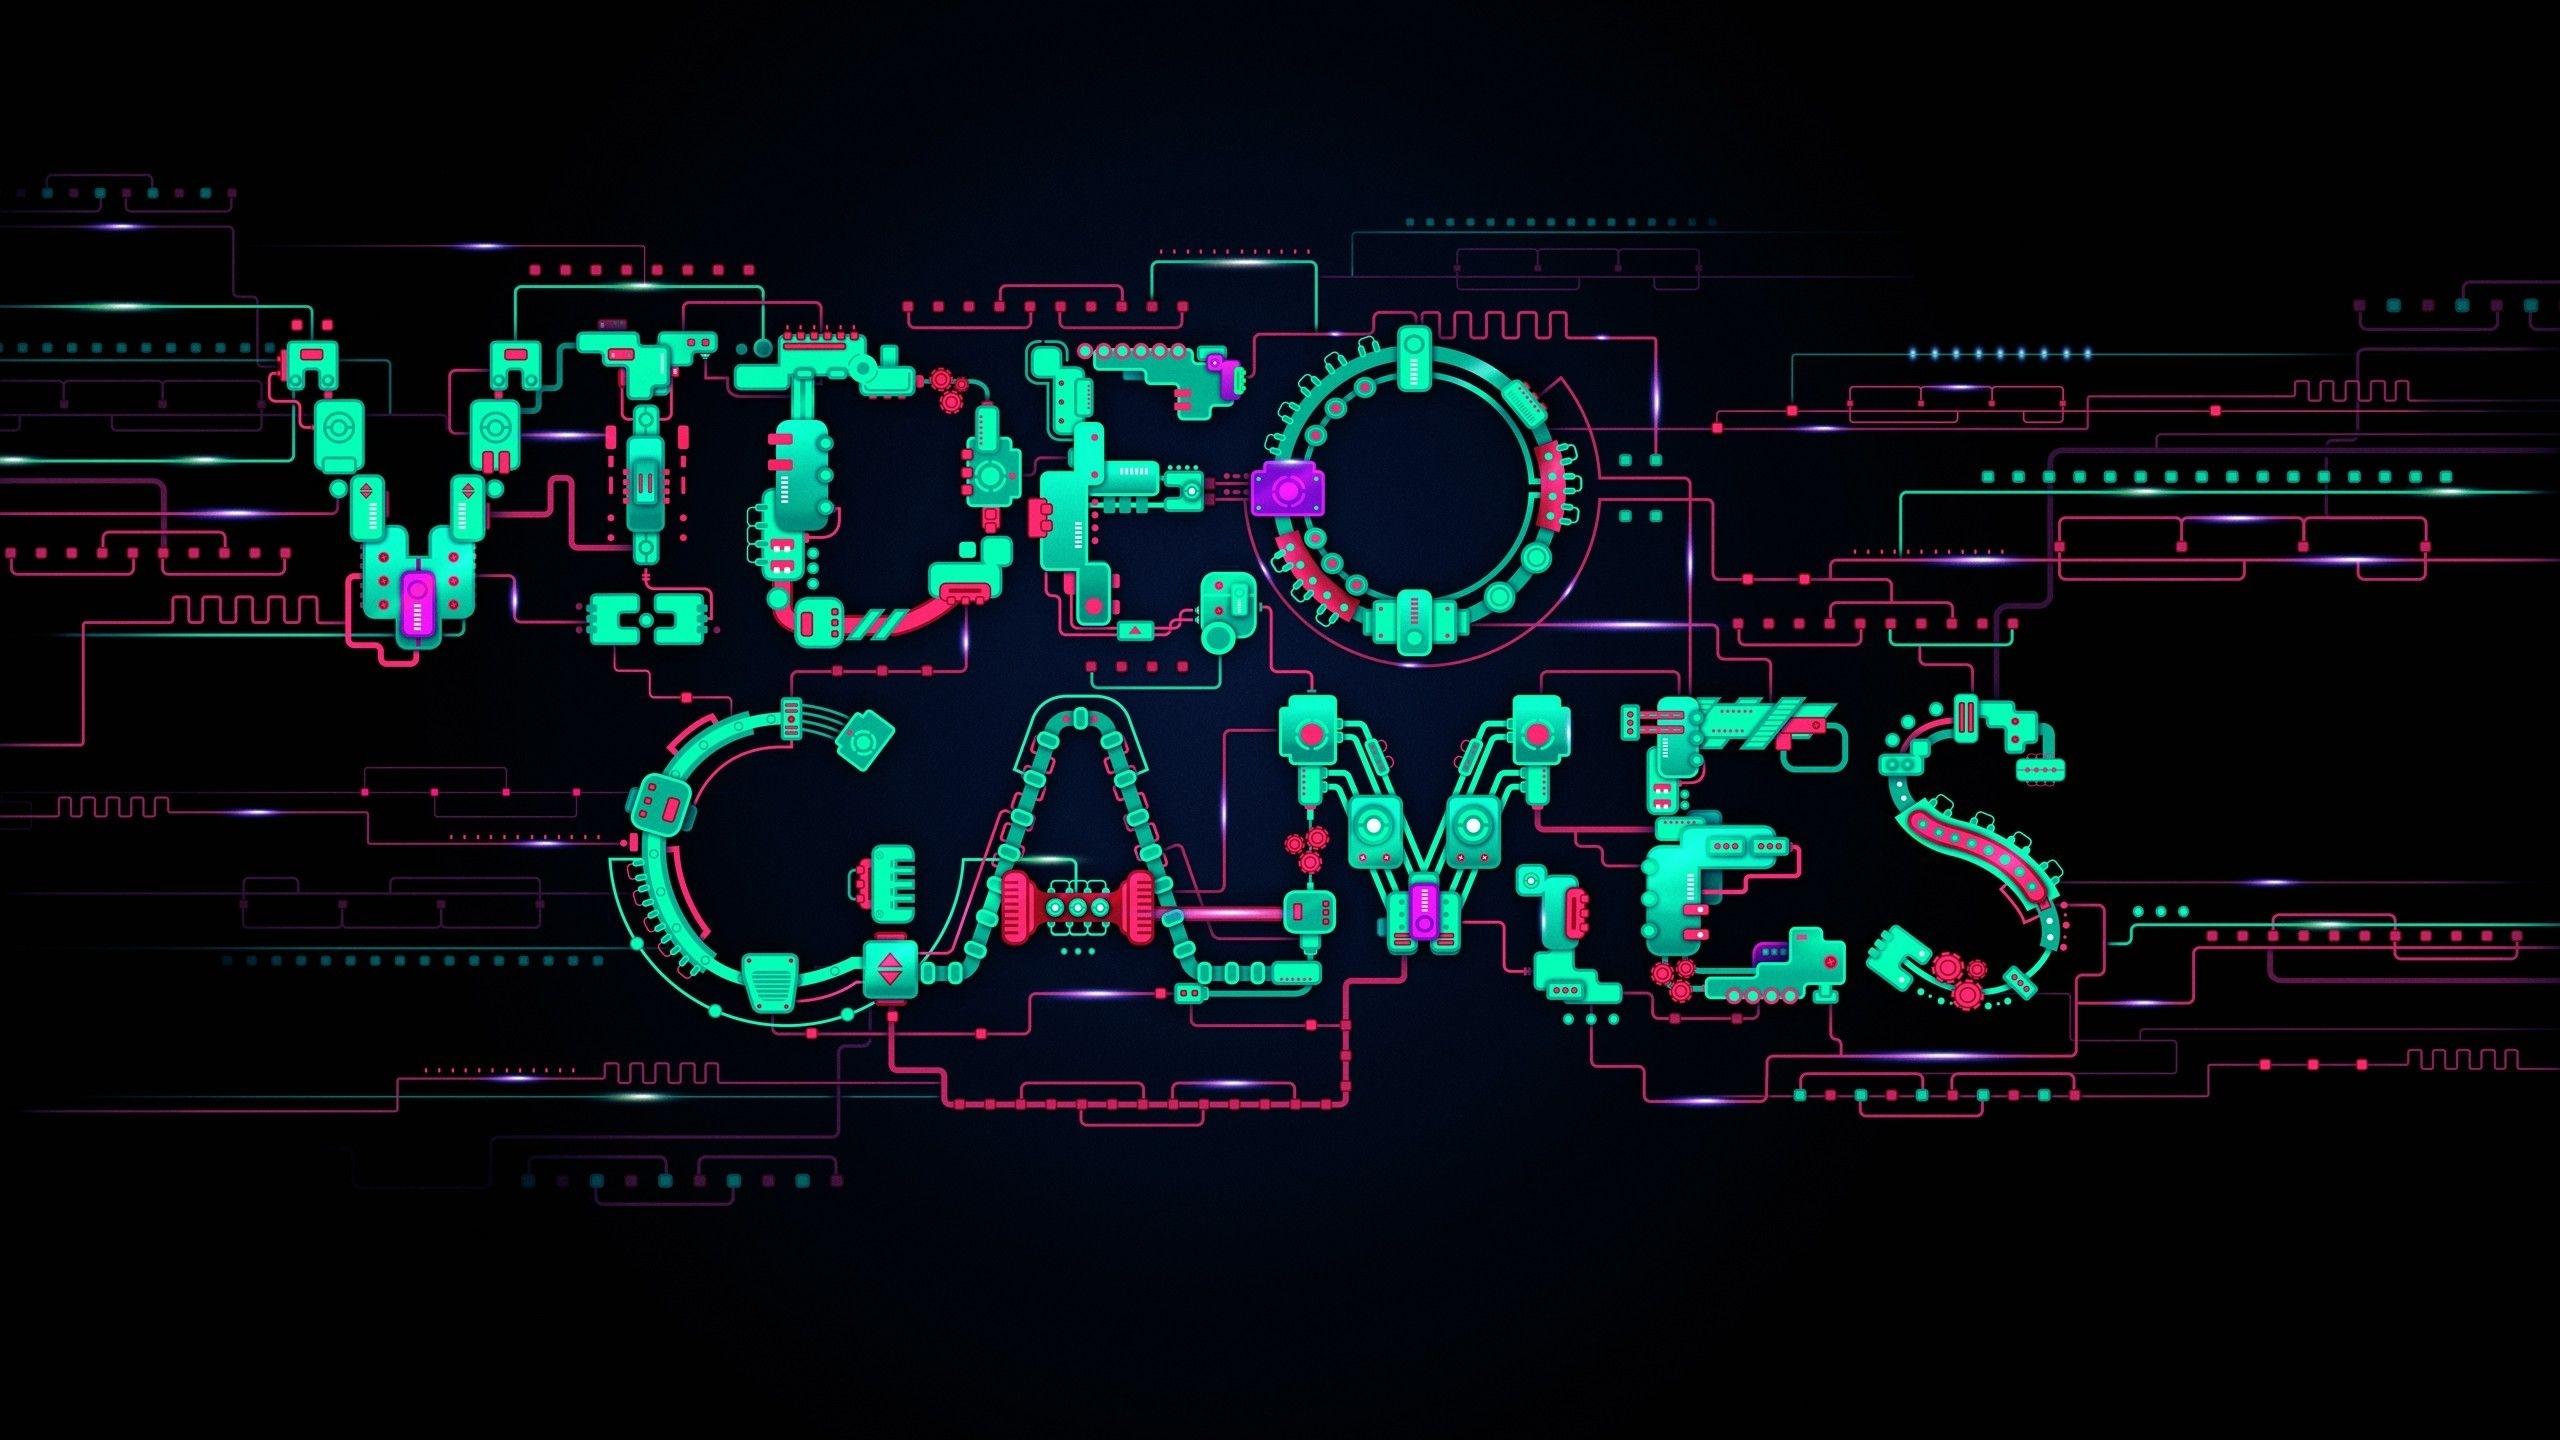 video games gamer wallpaper 2560x1440 #2918 wallpaper | hdcutepics